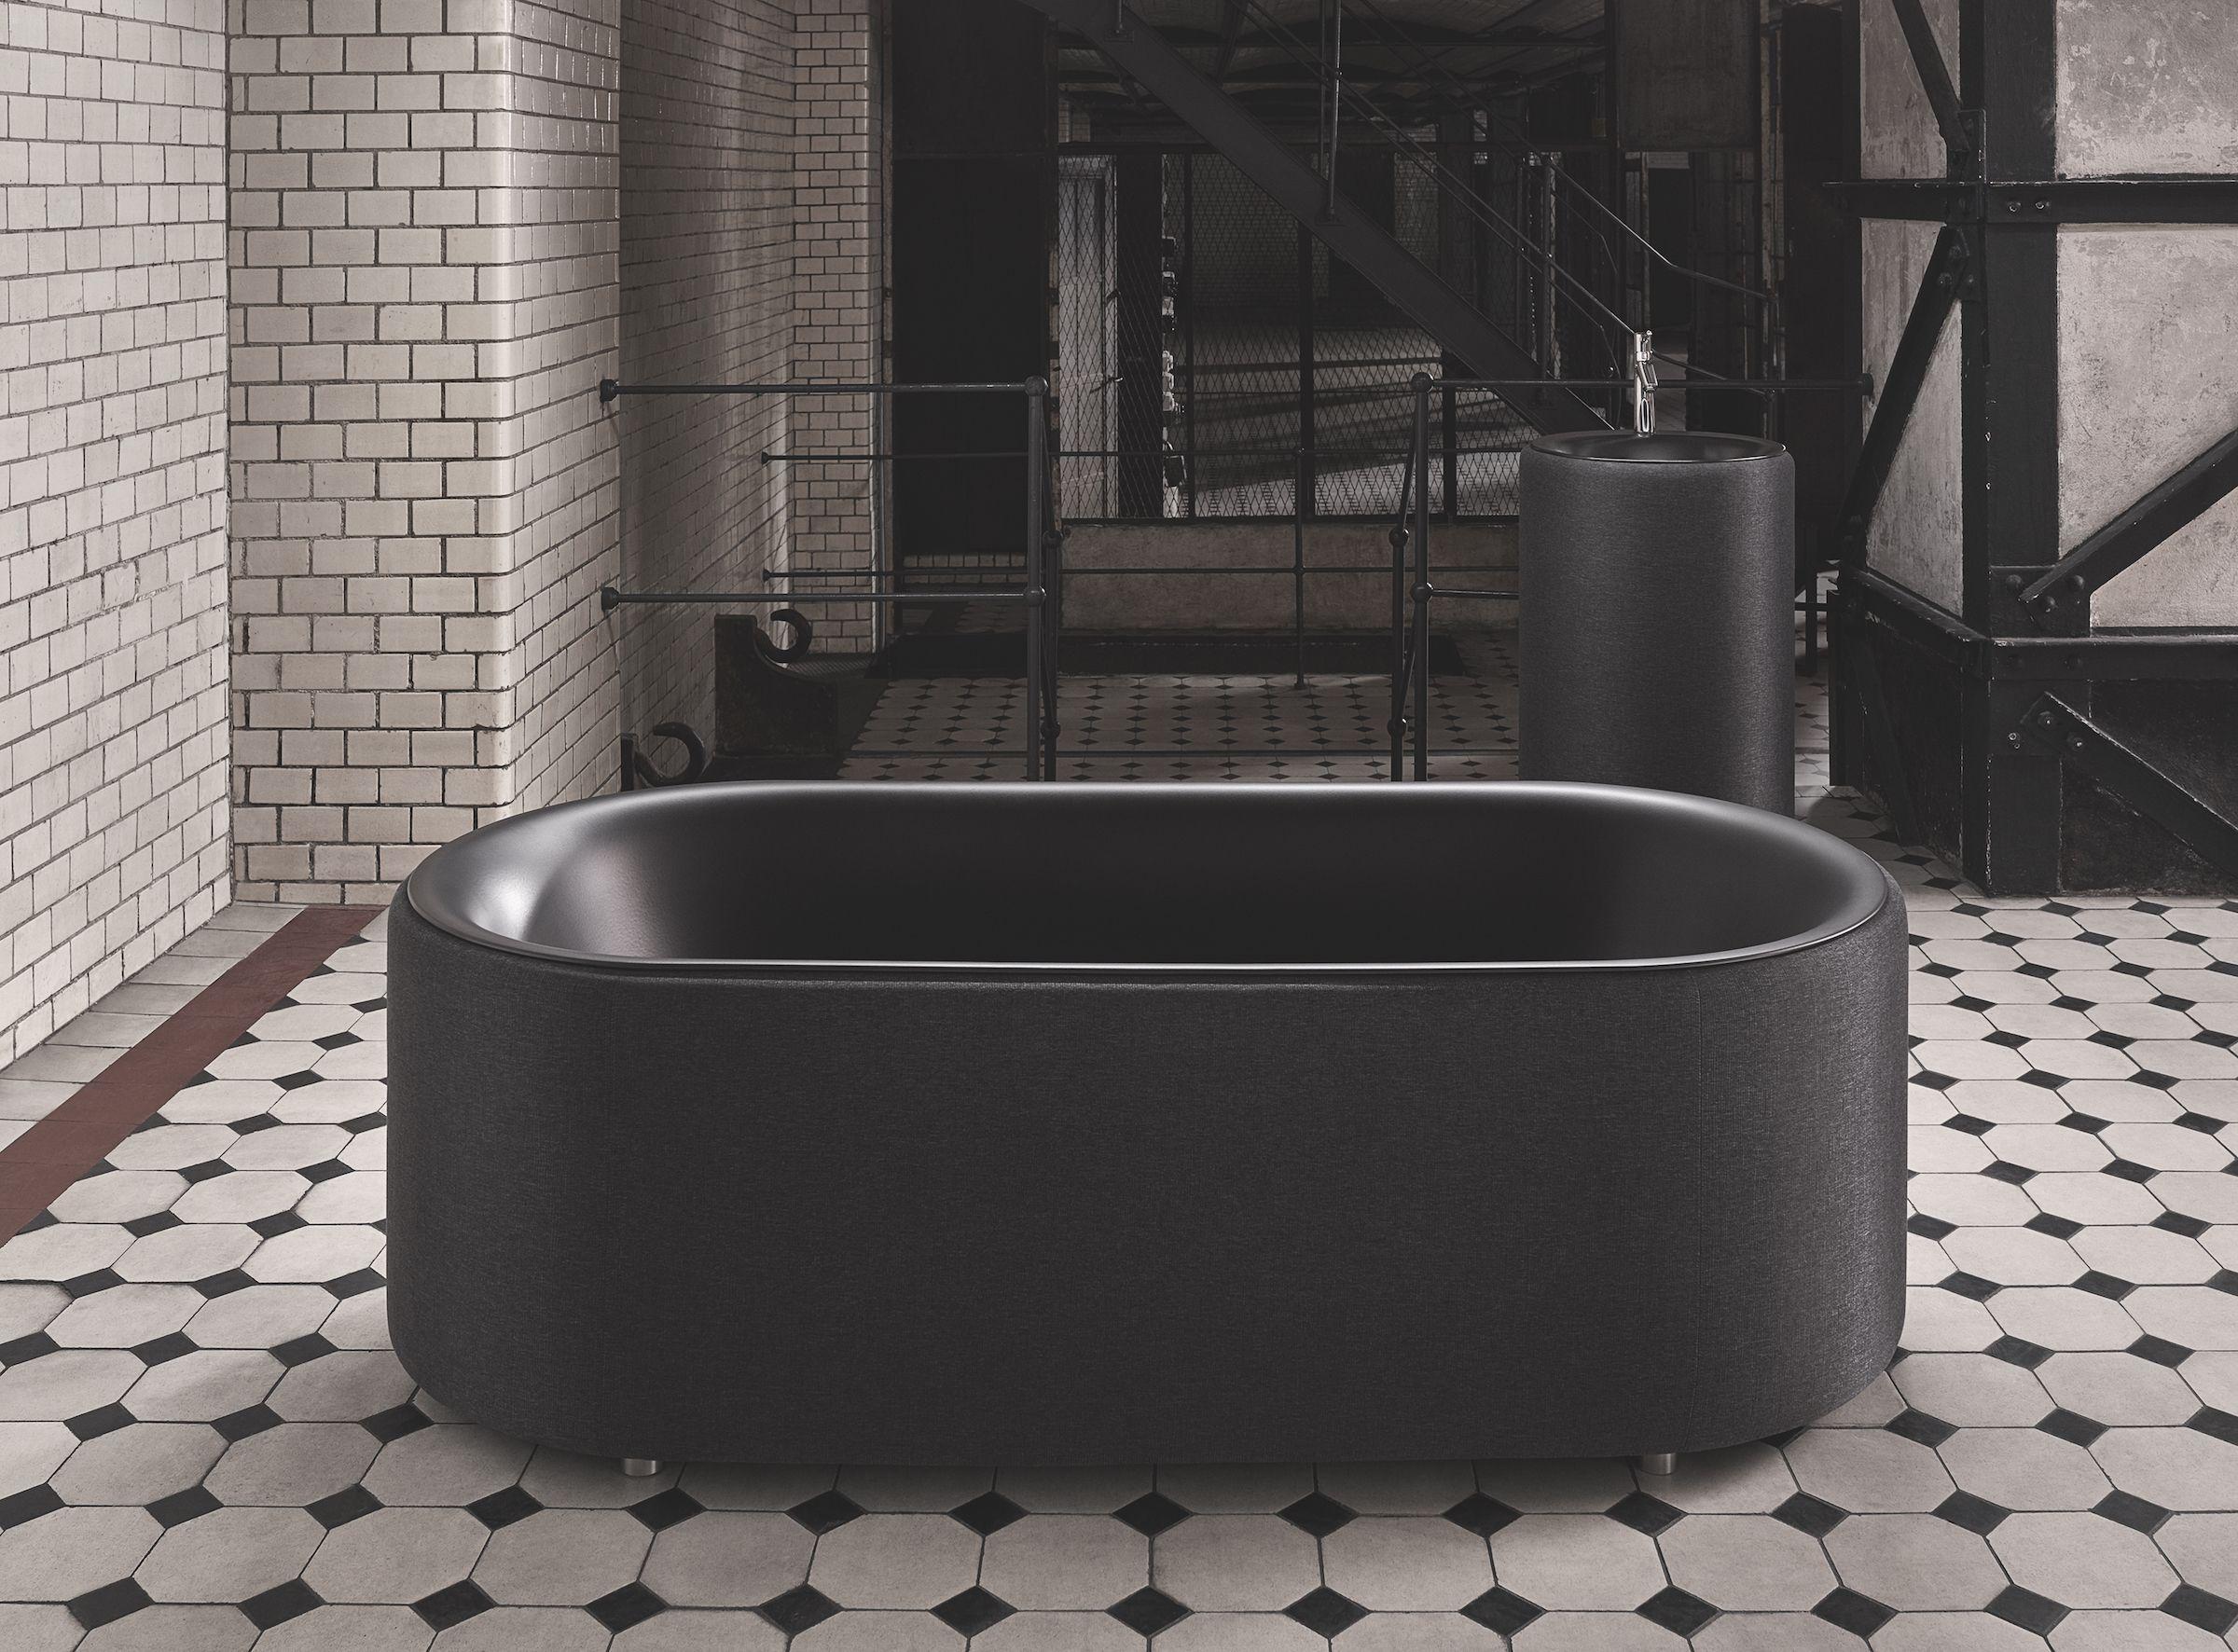 Bette Lux Oval Couture Carbon Bath Bathtub Bathroom Interior Black Allblackeverthing Trends Badewanne Bad Inspiration Freistehende Badewanne